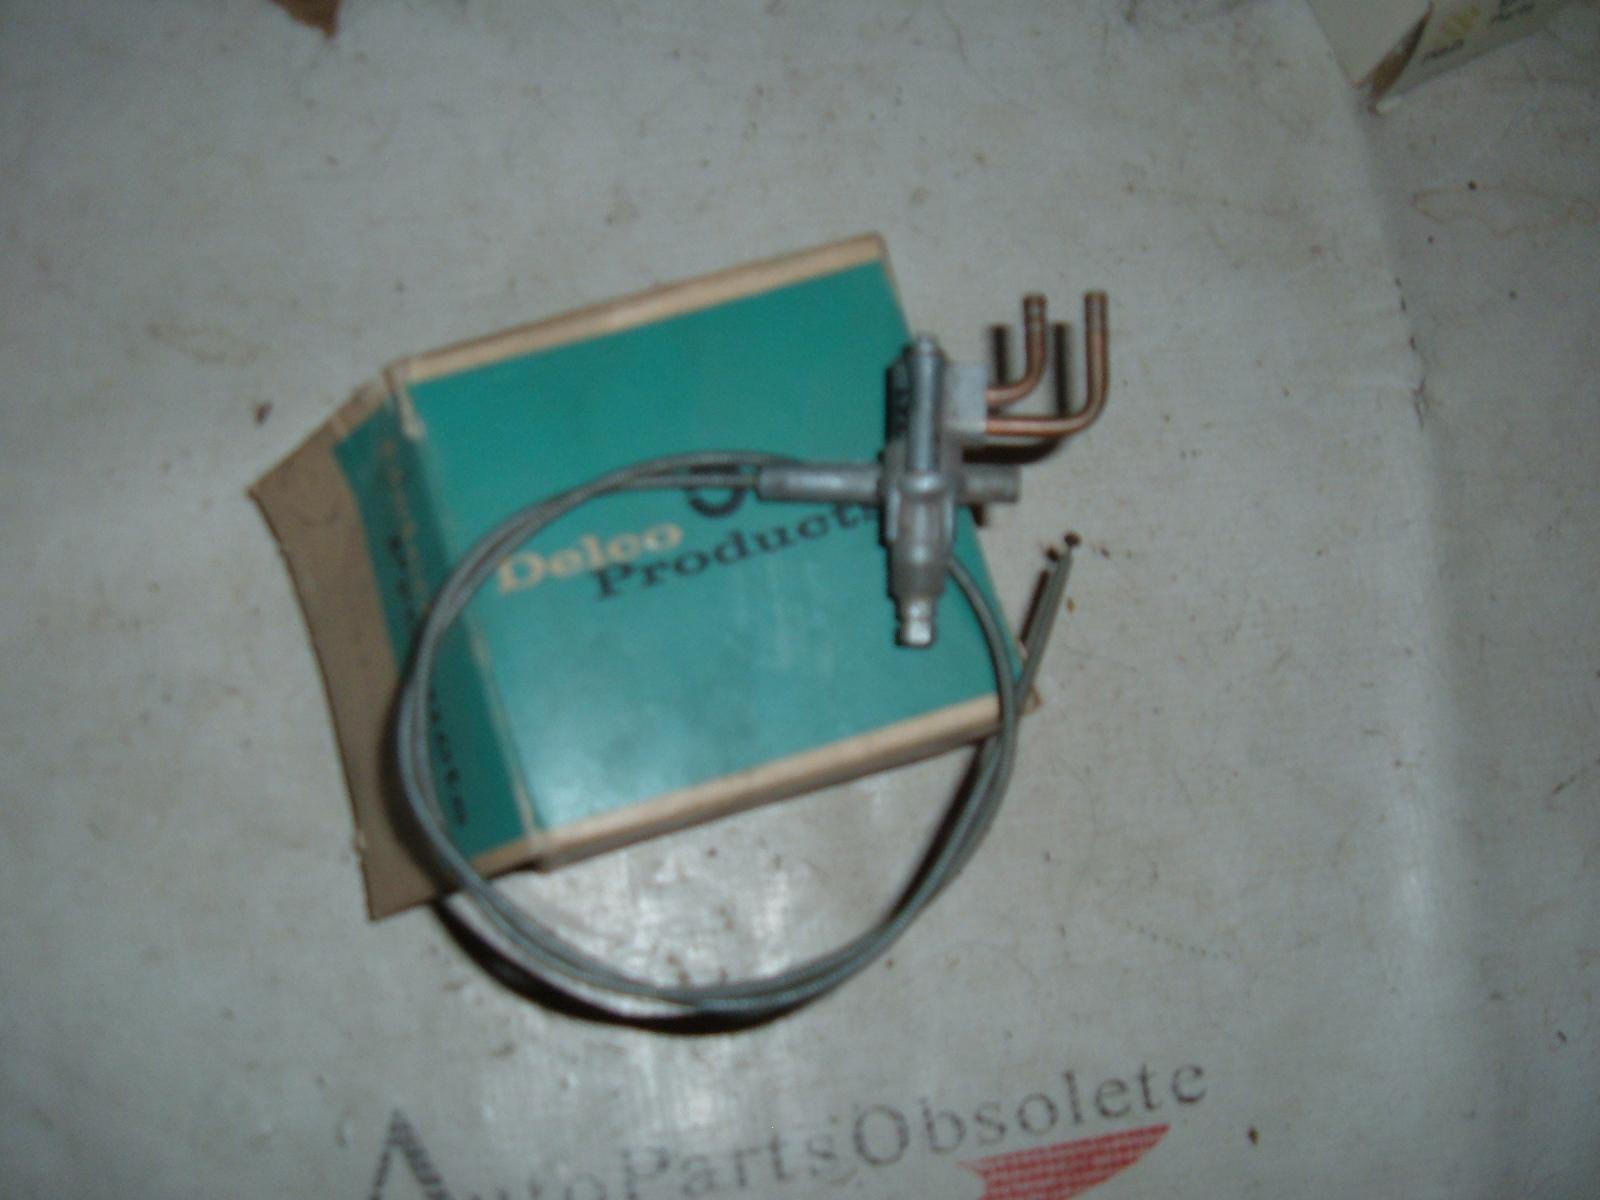 1955 chevrolet windshield wiper switch nos gm 4653454 (z 4653454)